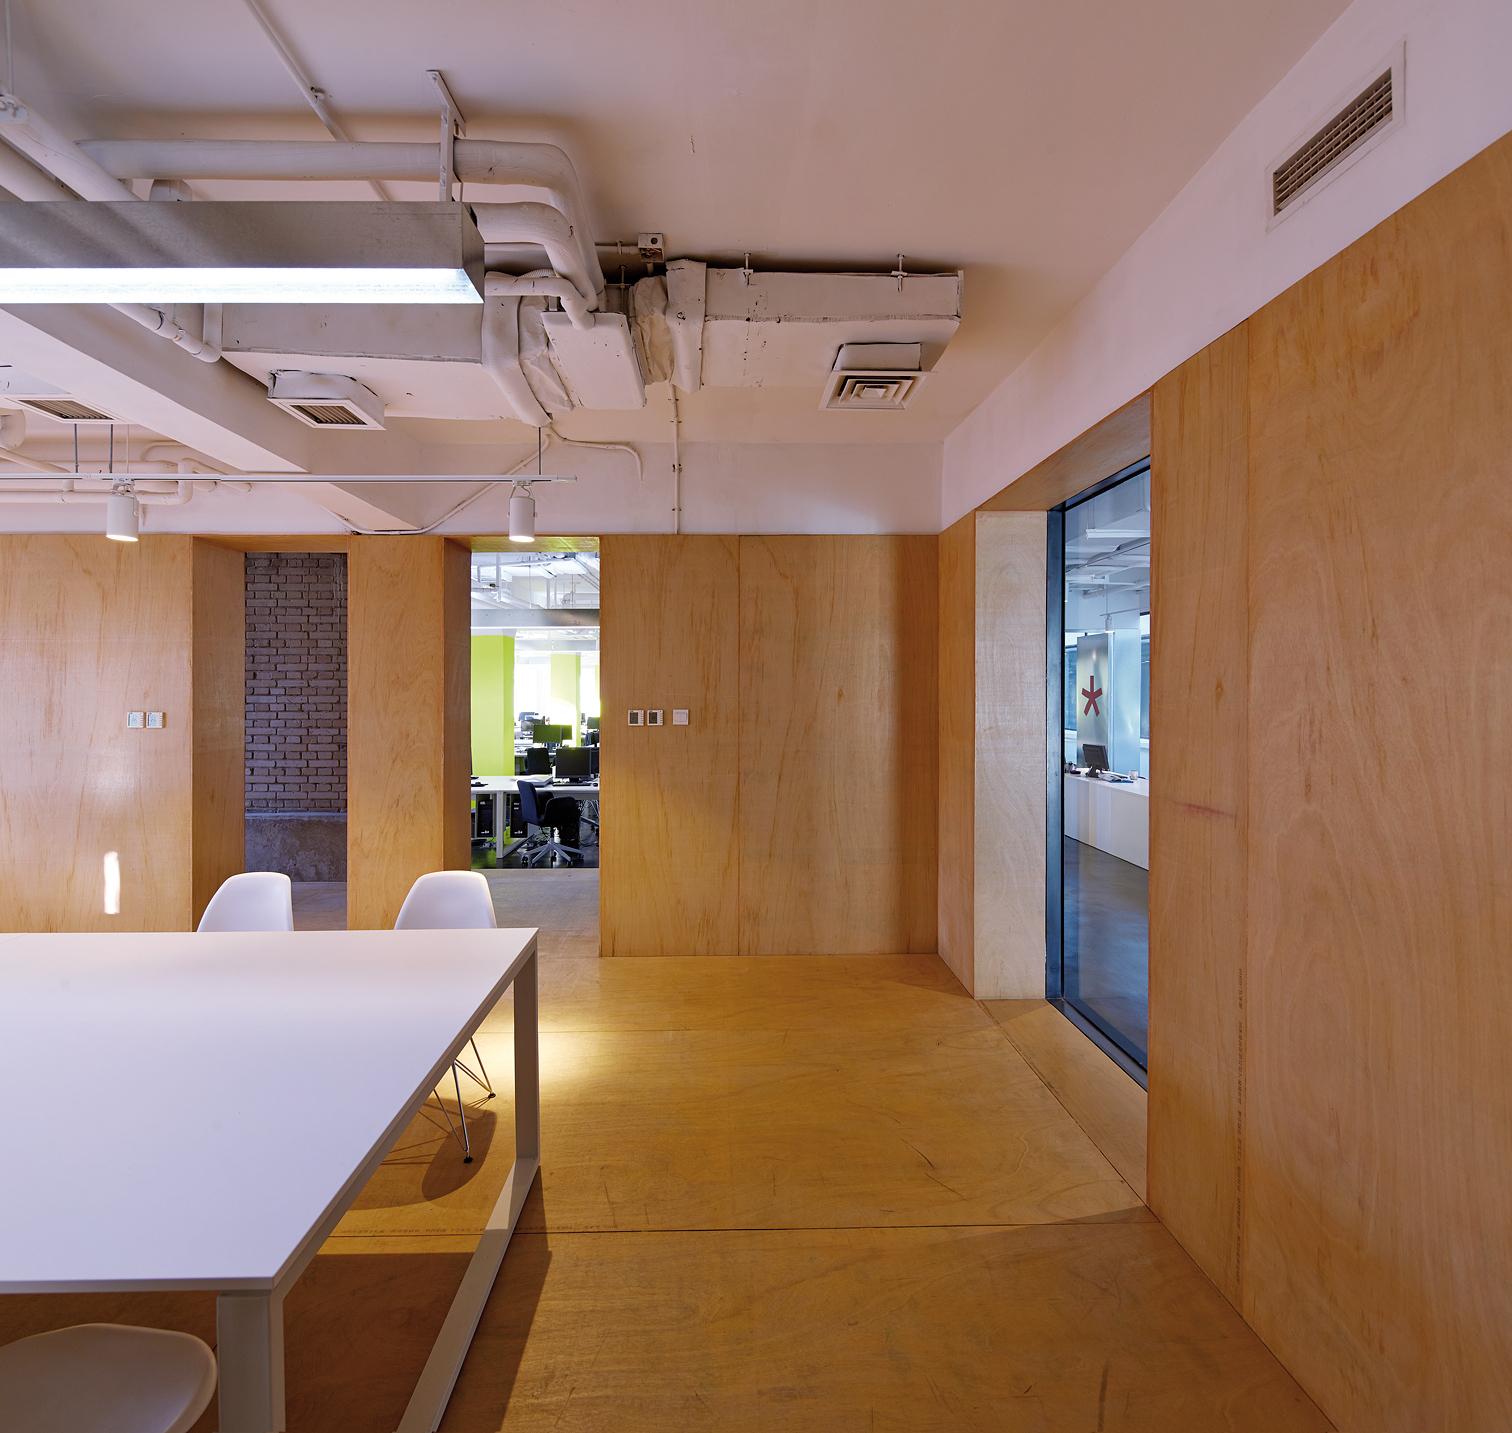 54ecb577e58ece7746000019_spark-beijing-office-spark-architects_0238_spark_beijing_office_n9_a3